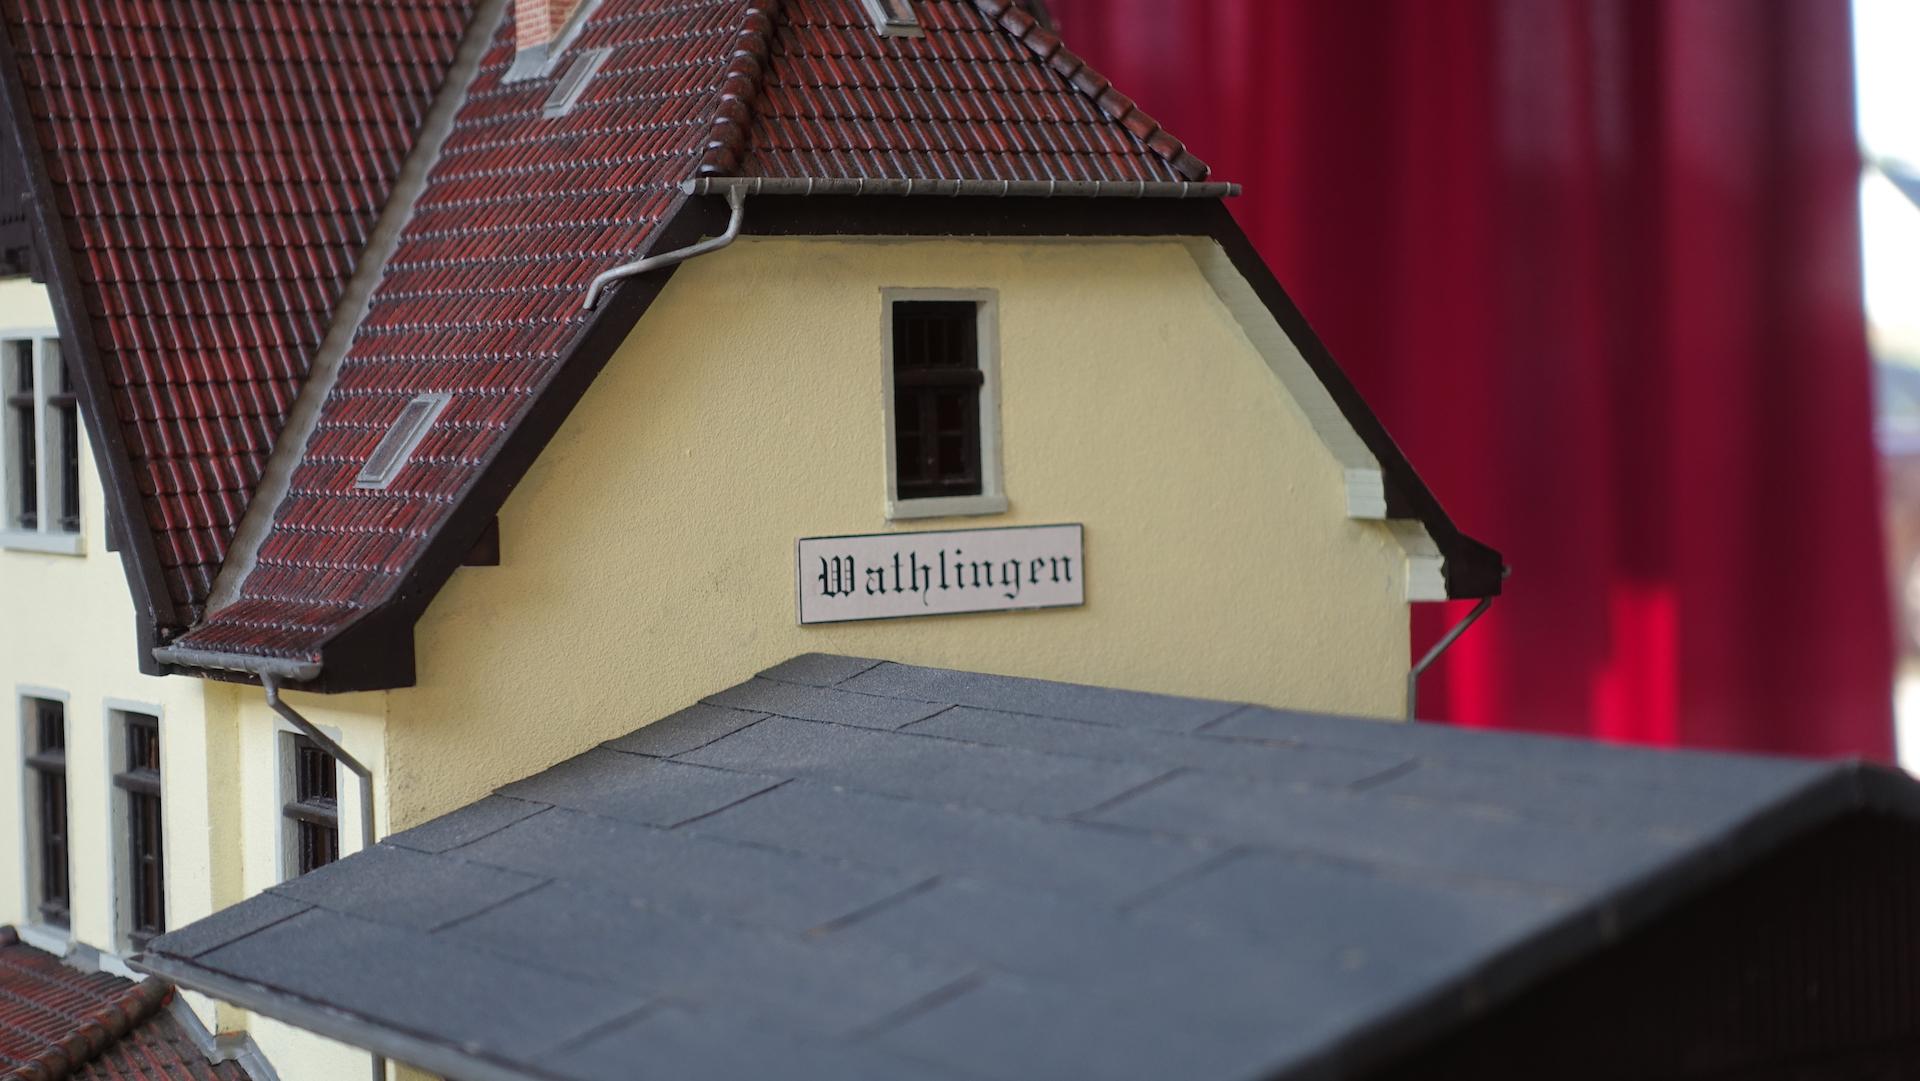 18_09_08_Austellung-Wathlingen_100